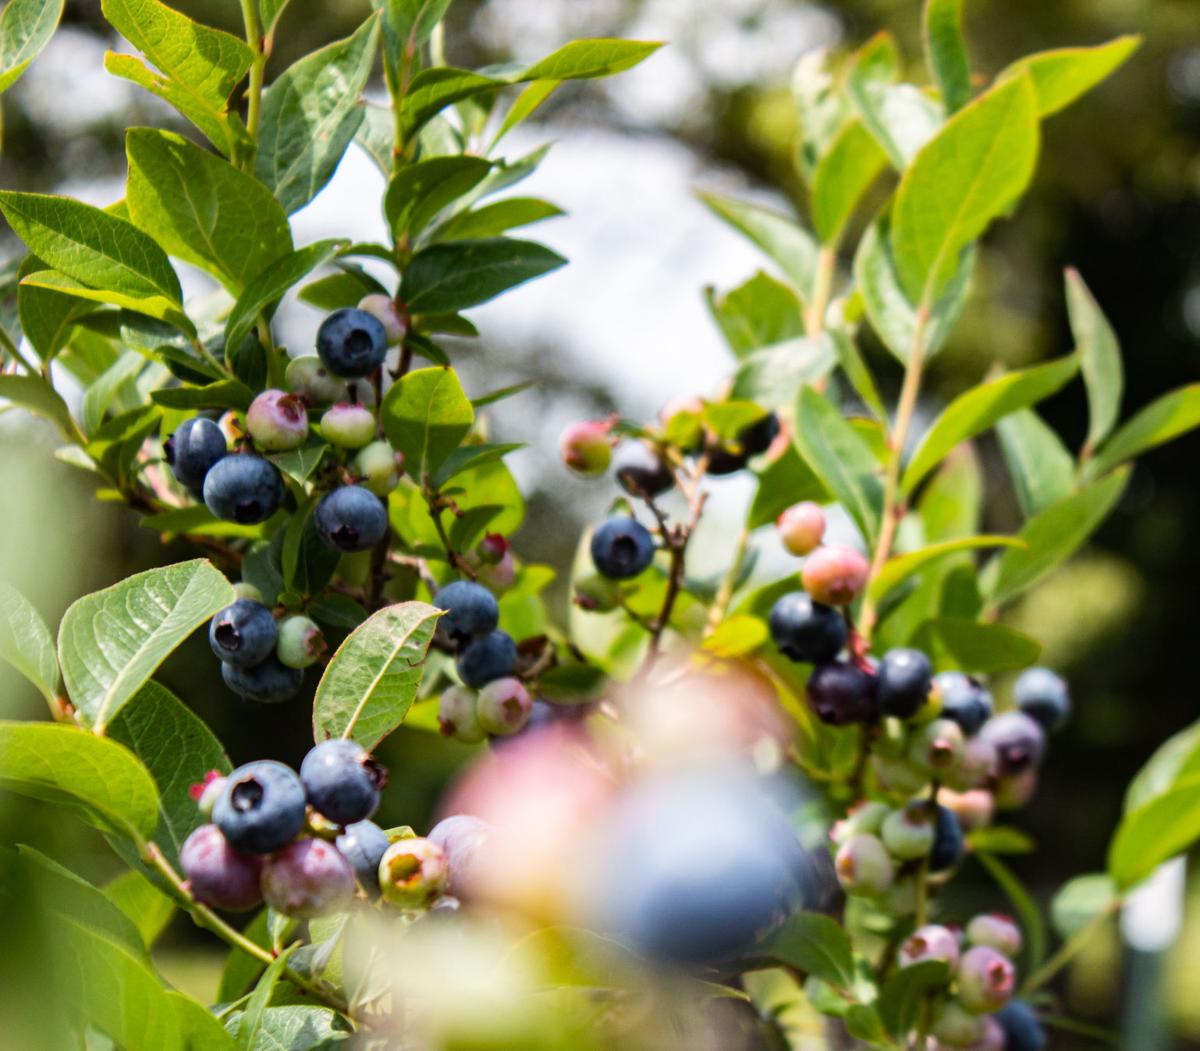 Yolanda Jones: Blueberry farmer and market organizer